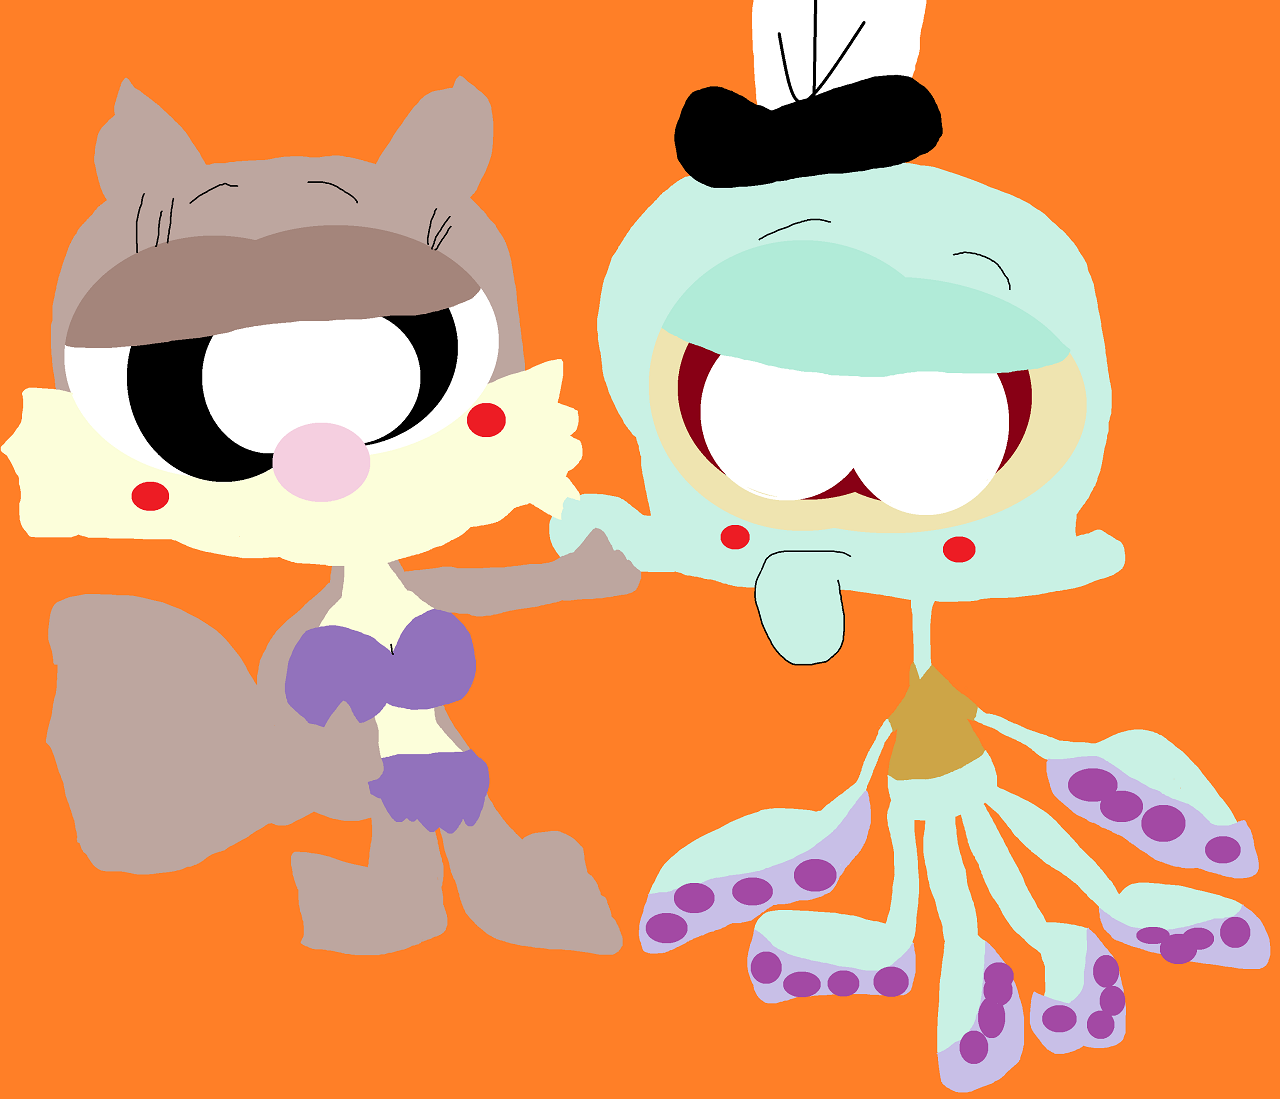 Cute Random Chibi Sandy Coming Ontro Squidward Alt by Falconlobo